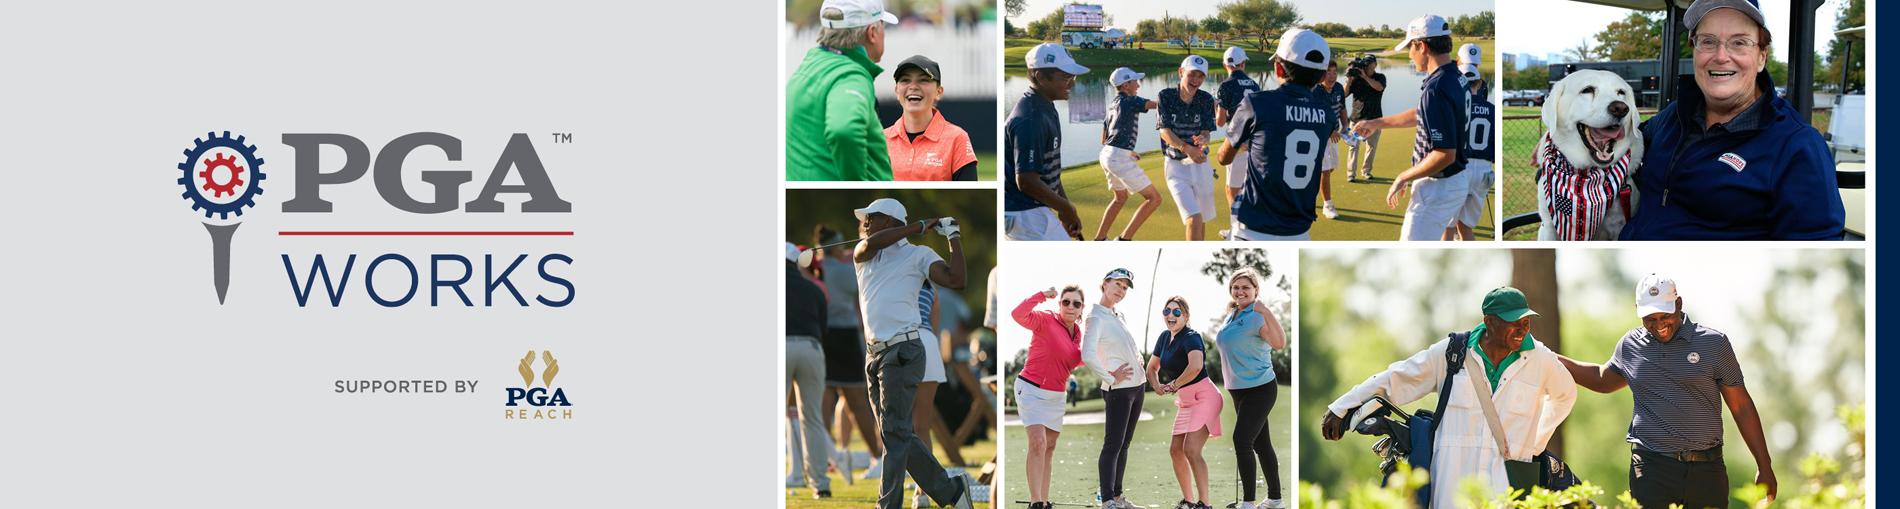 PGA Works Scholarship